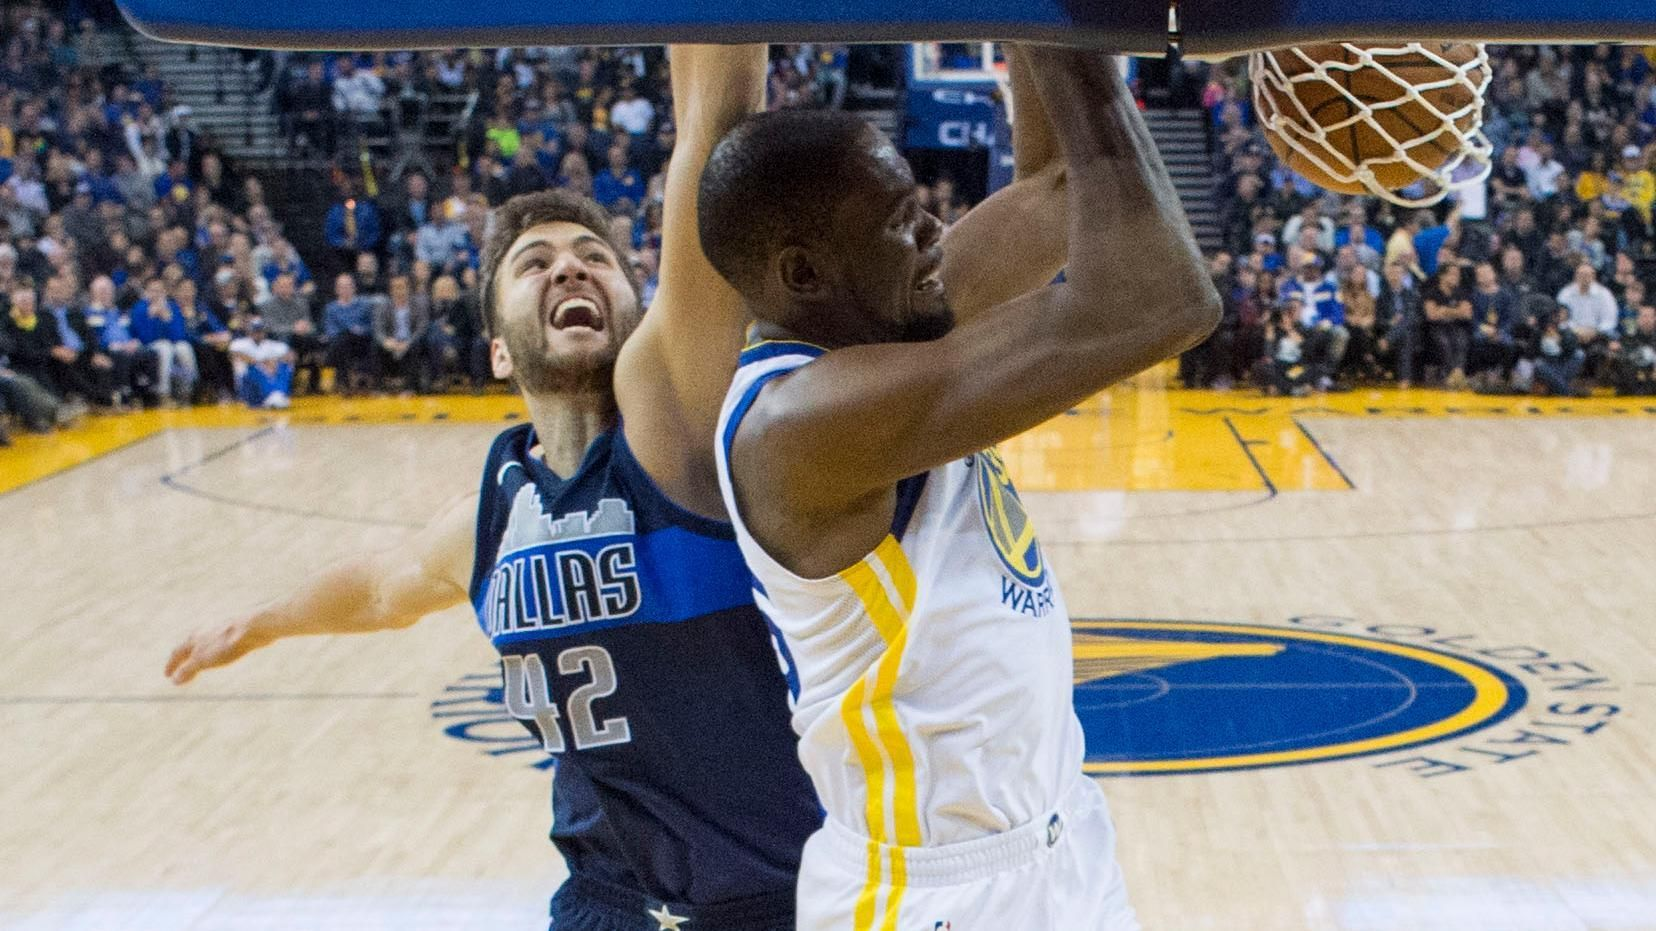 Aaron Judge loves KD's dunk